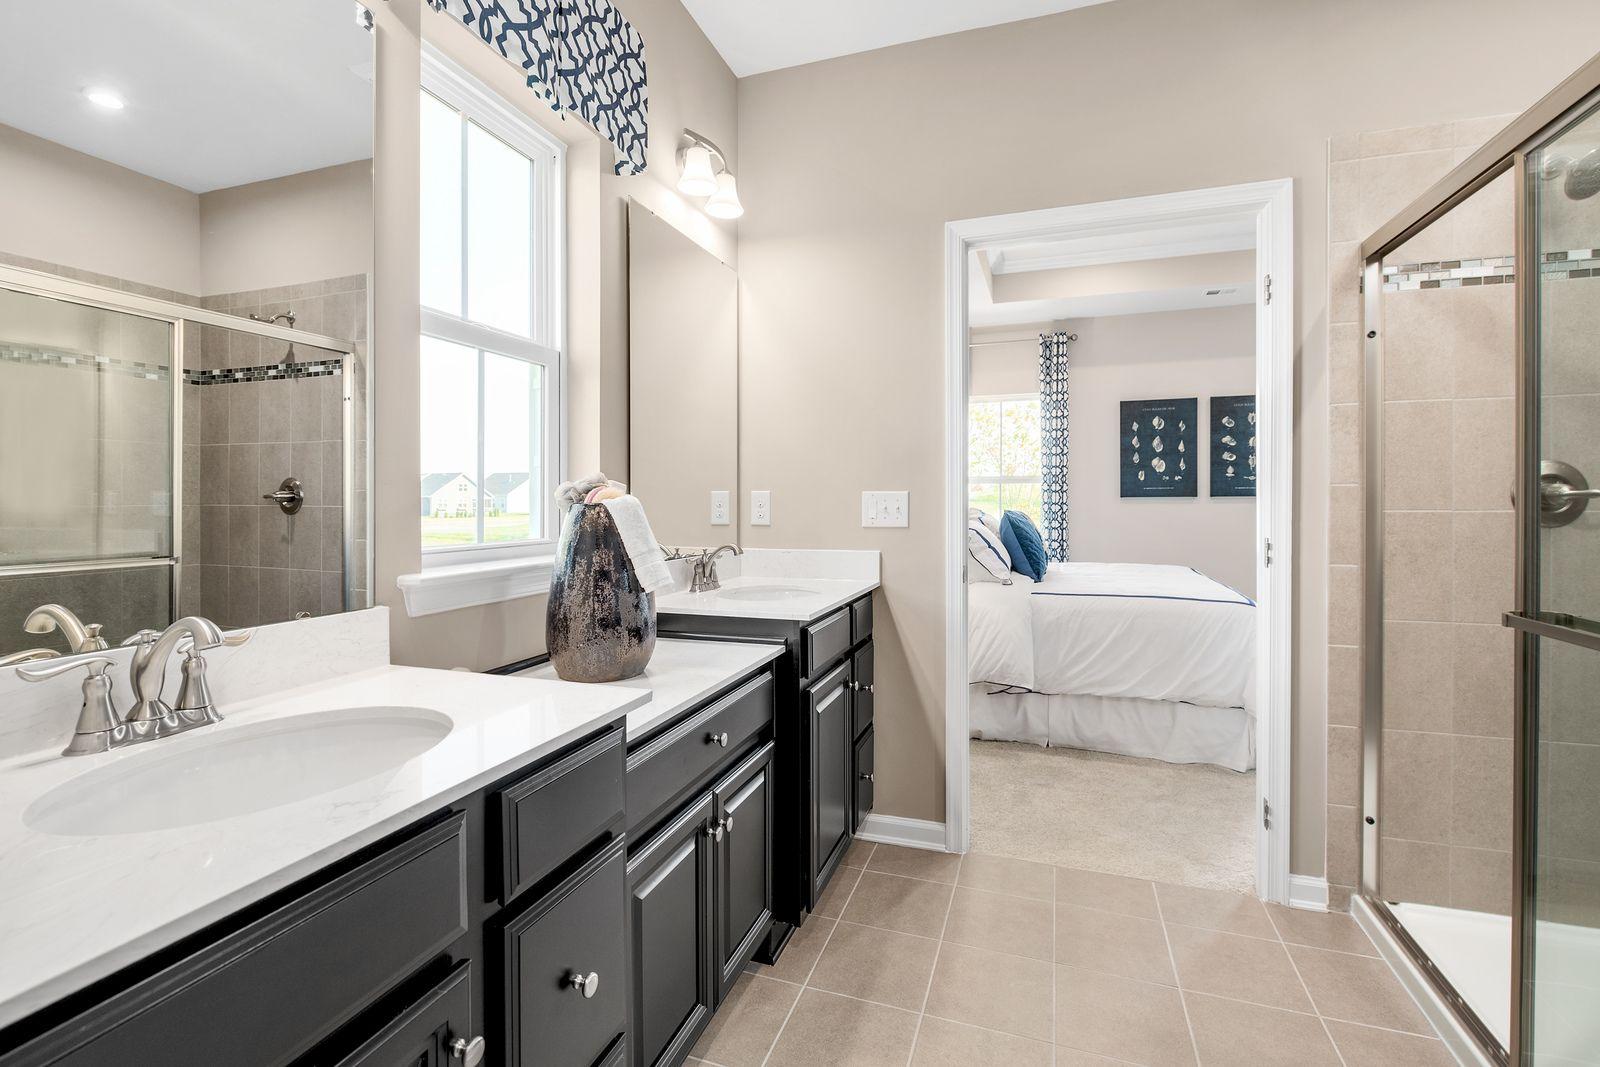 Bathroom featured in the Palladio By Ryan Homes in Philadelphia, NJ